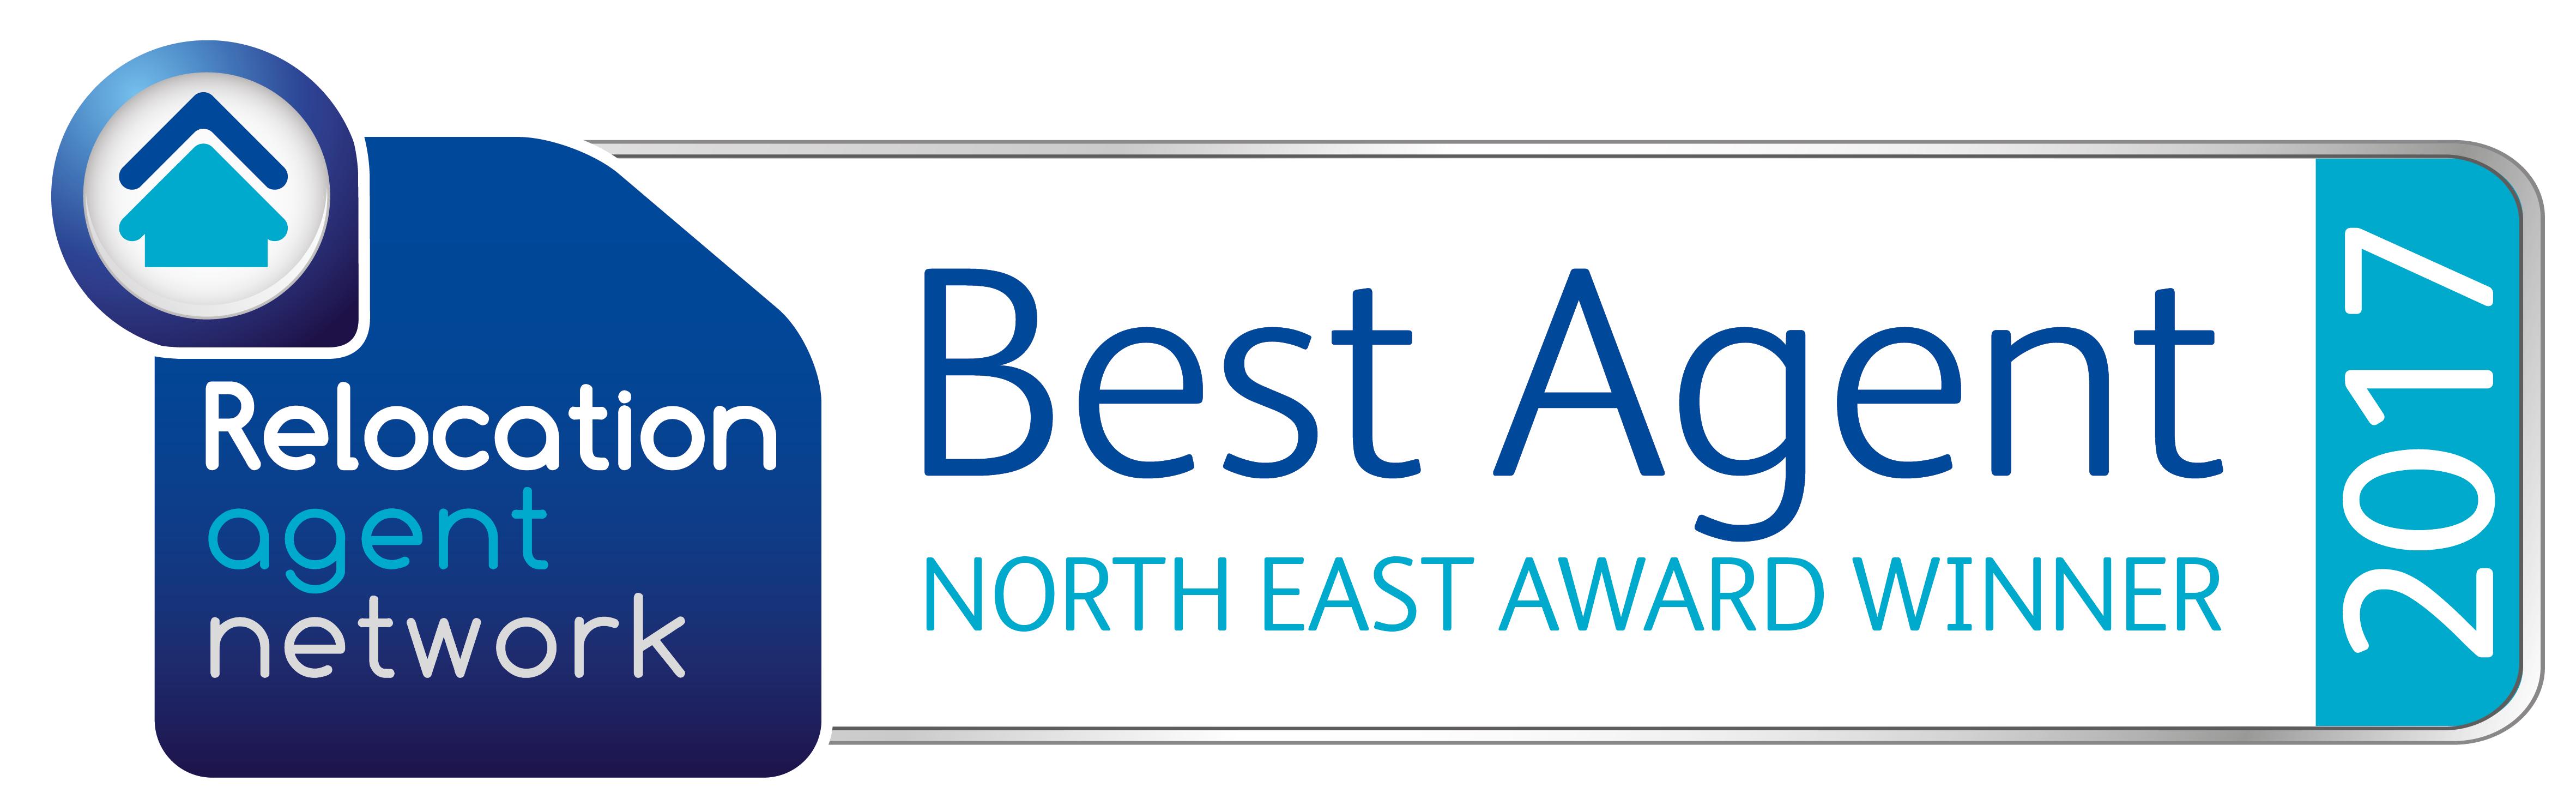 Relocation Agent Network Winner 2017